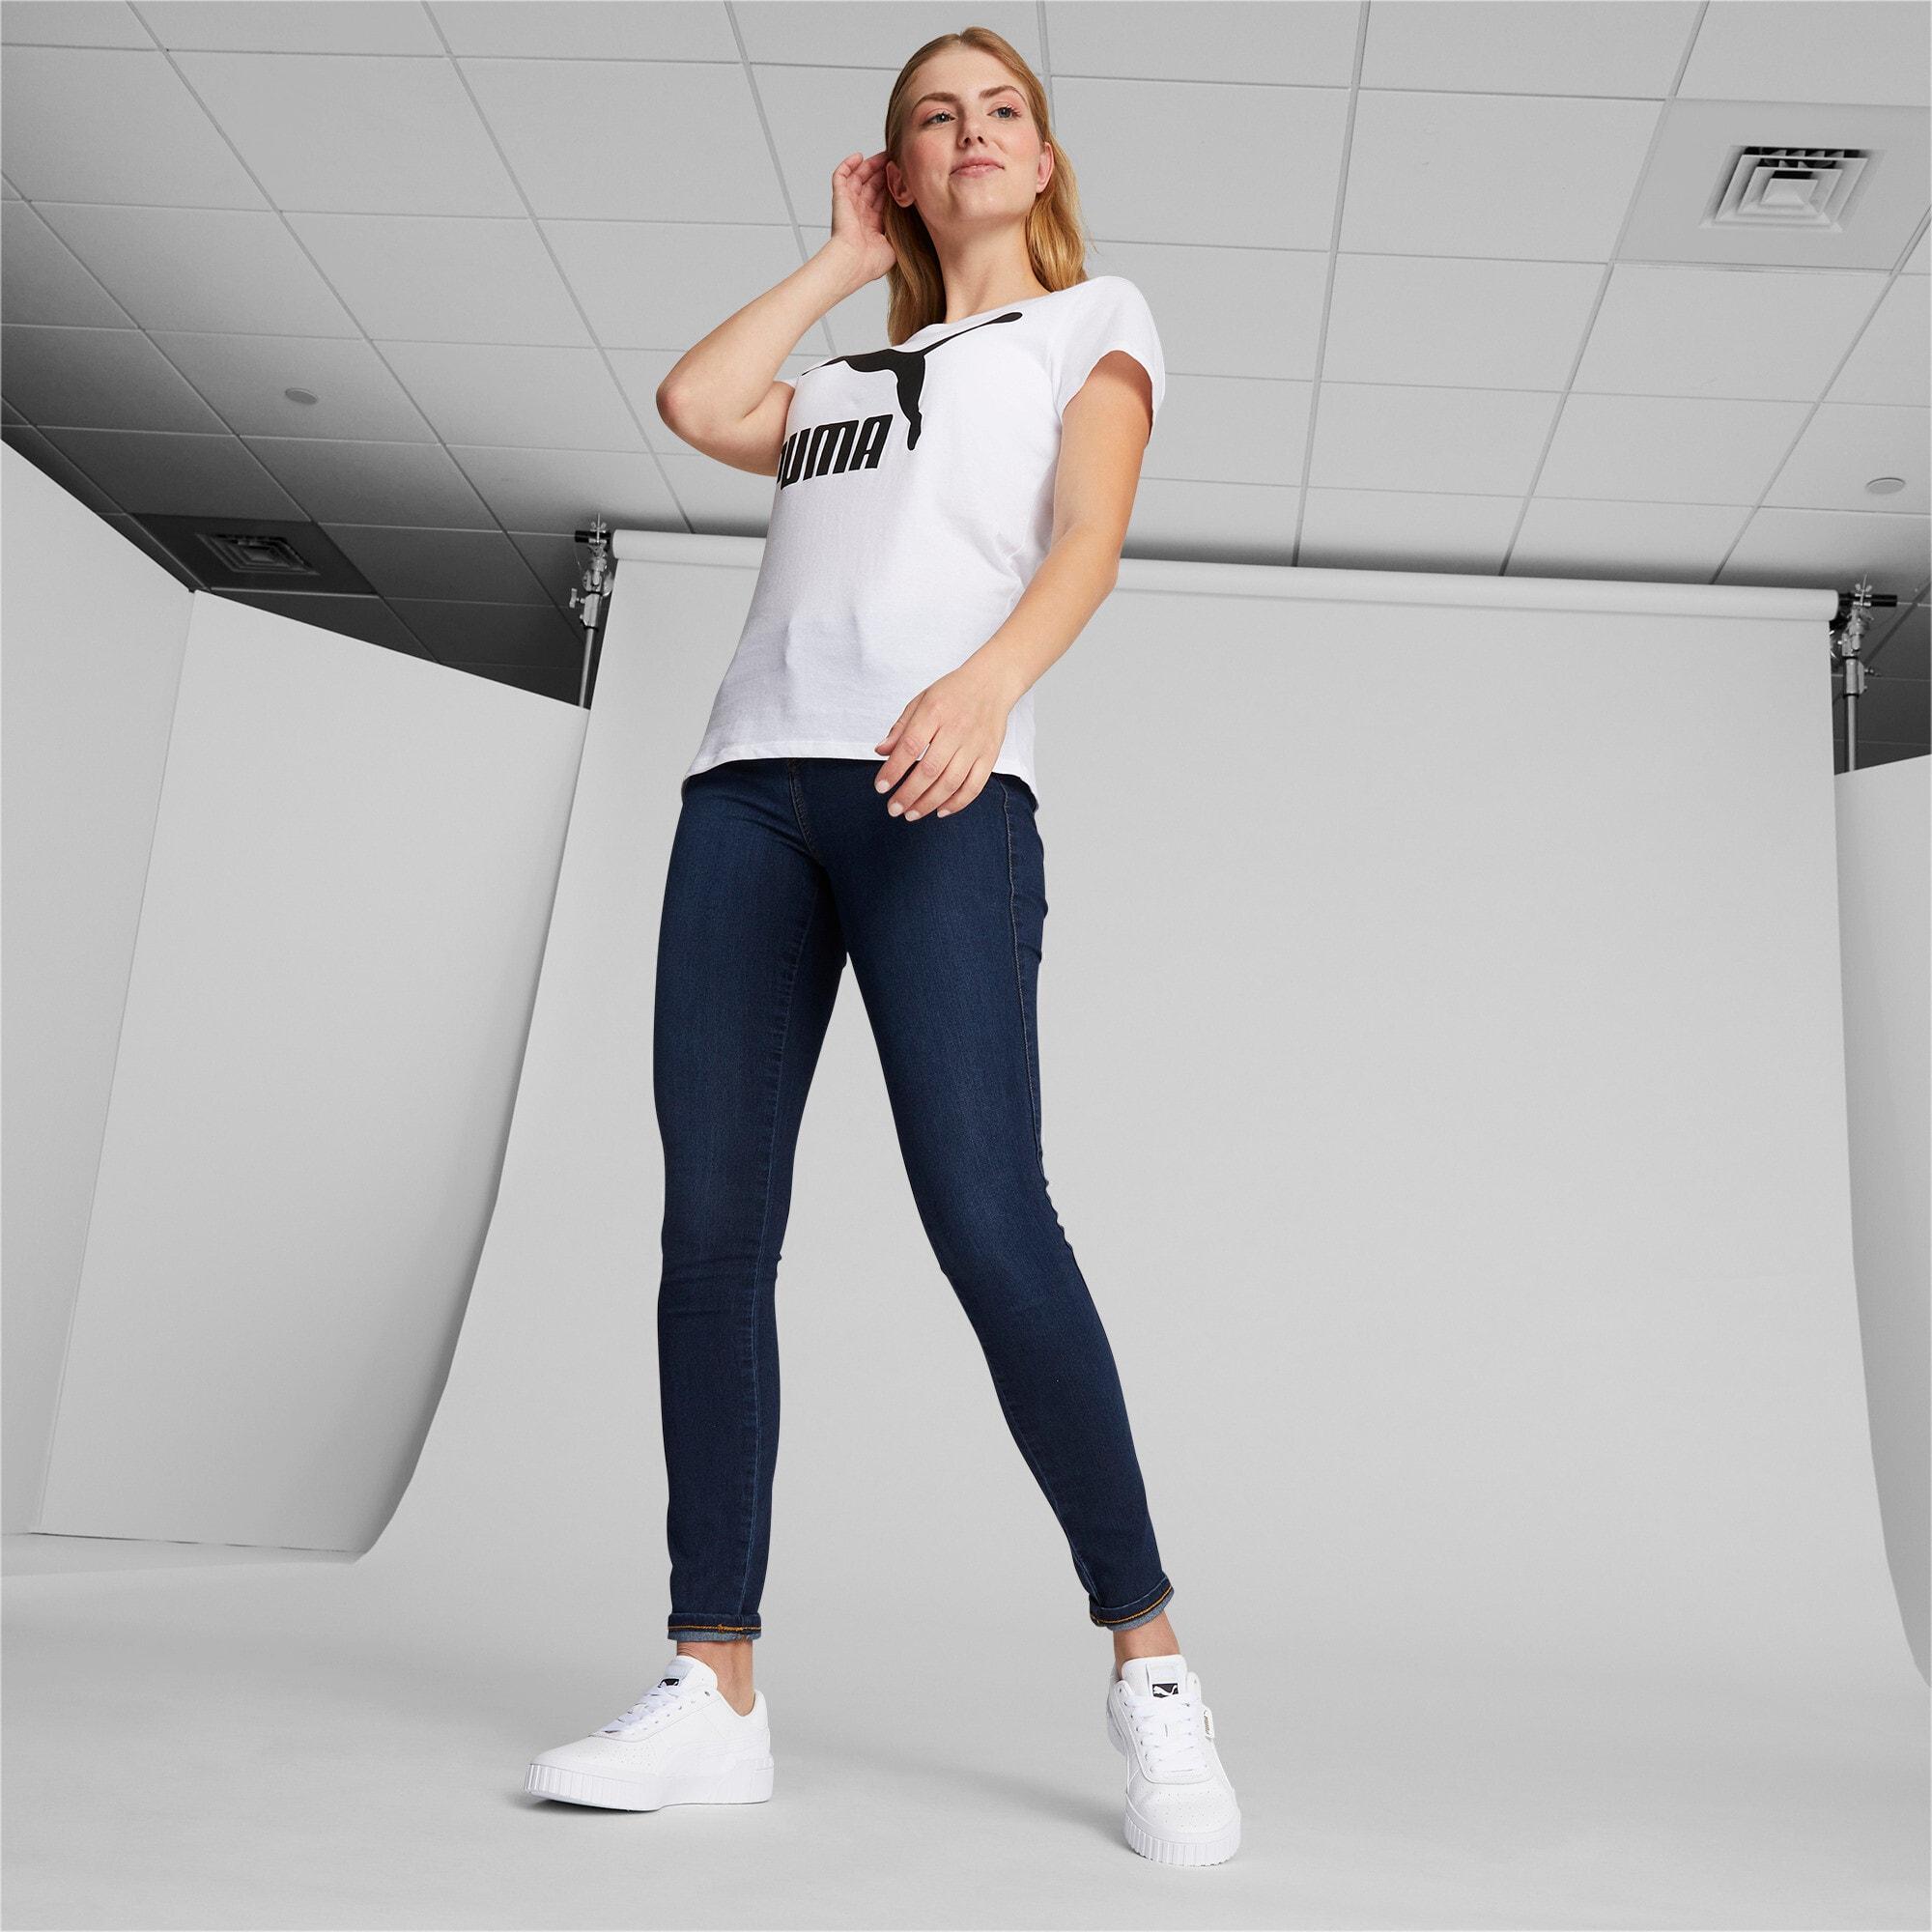 Thumbnail 2 of Cali Women's Sneakers, Puma White-Puma White, medium